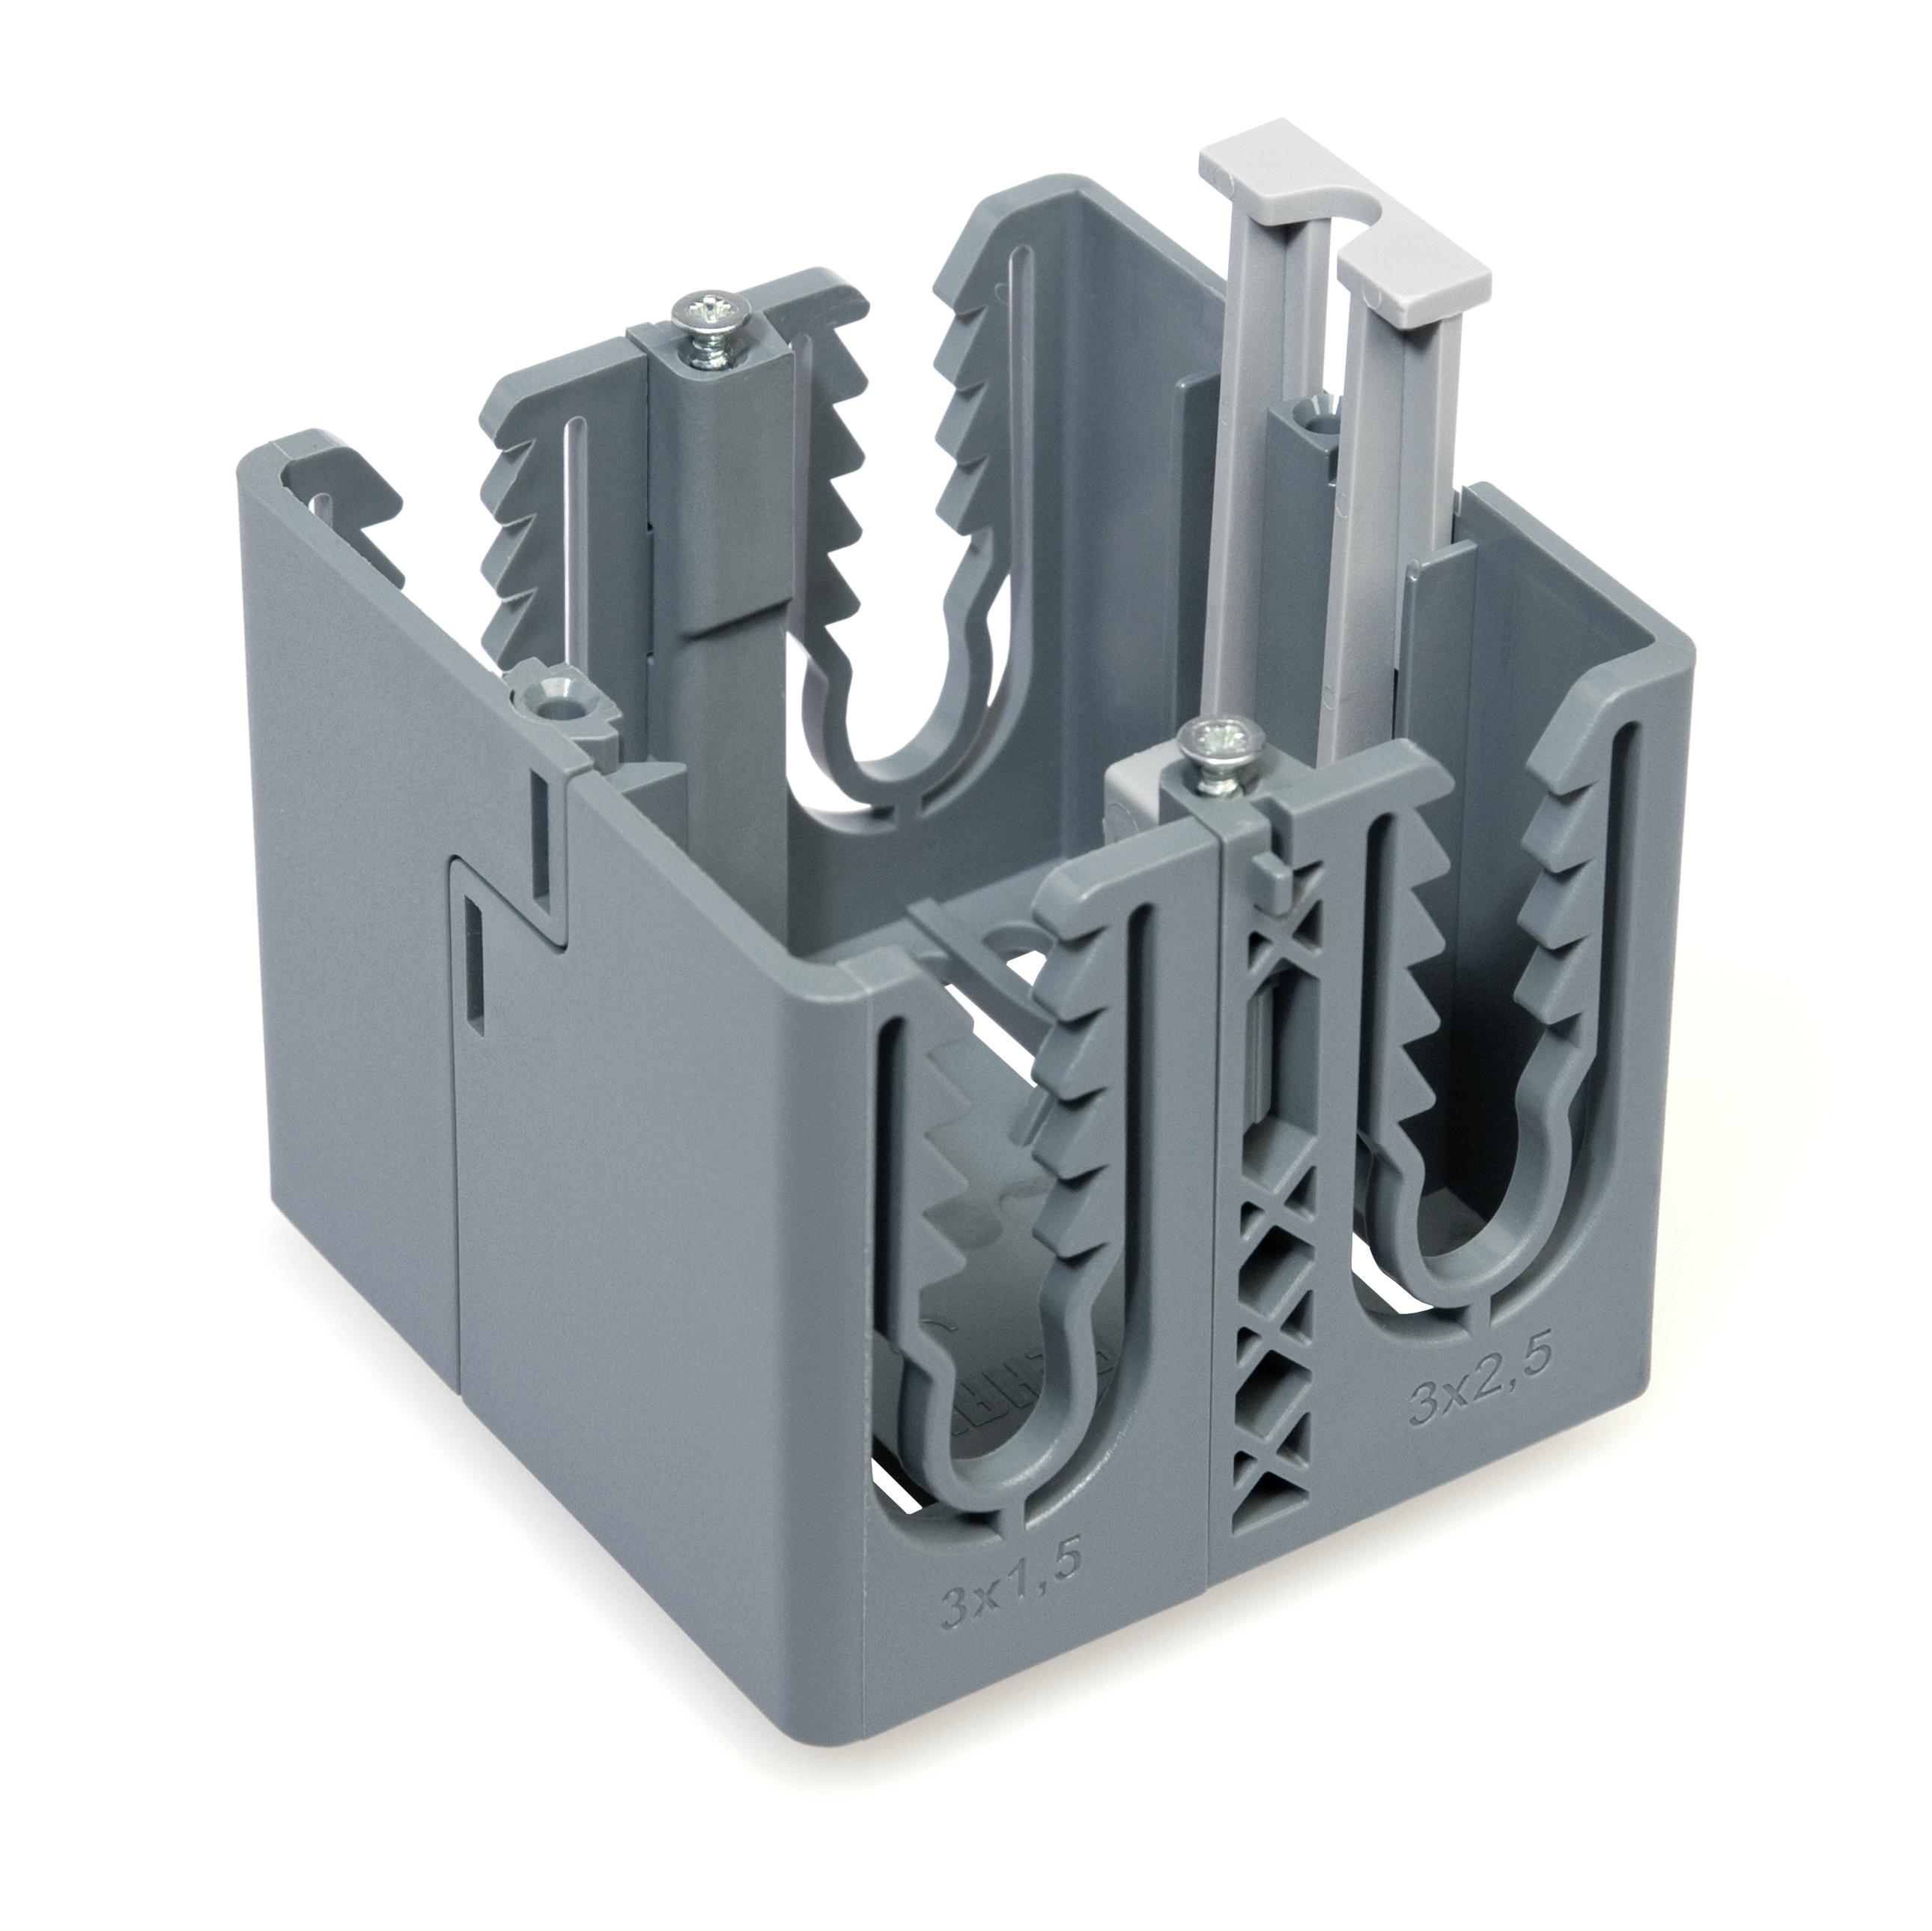 1 Stk Geräteeinbaudose für Brüstungskanal Signa Base, grau RH701003--